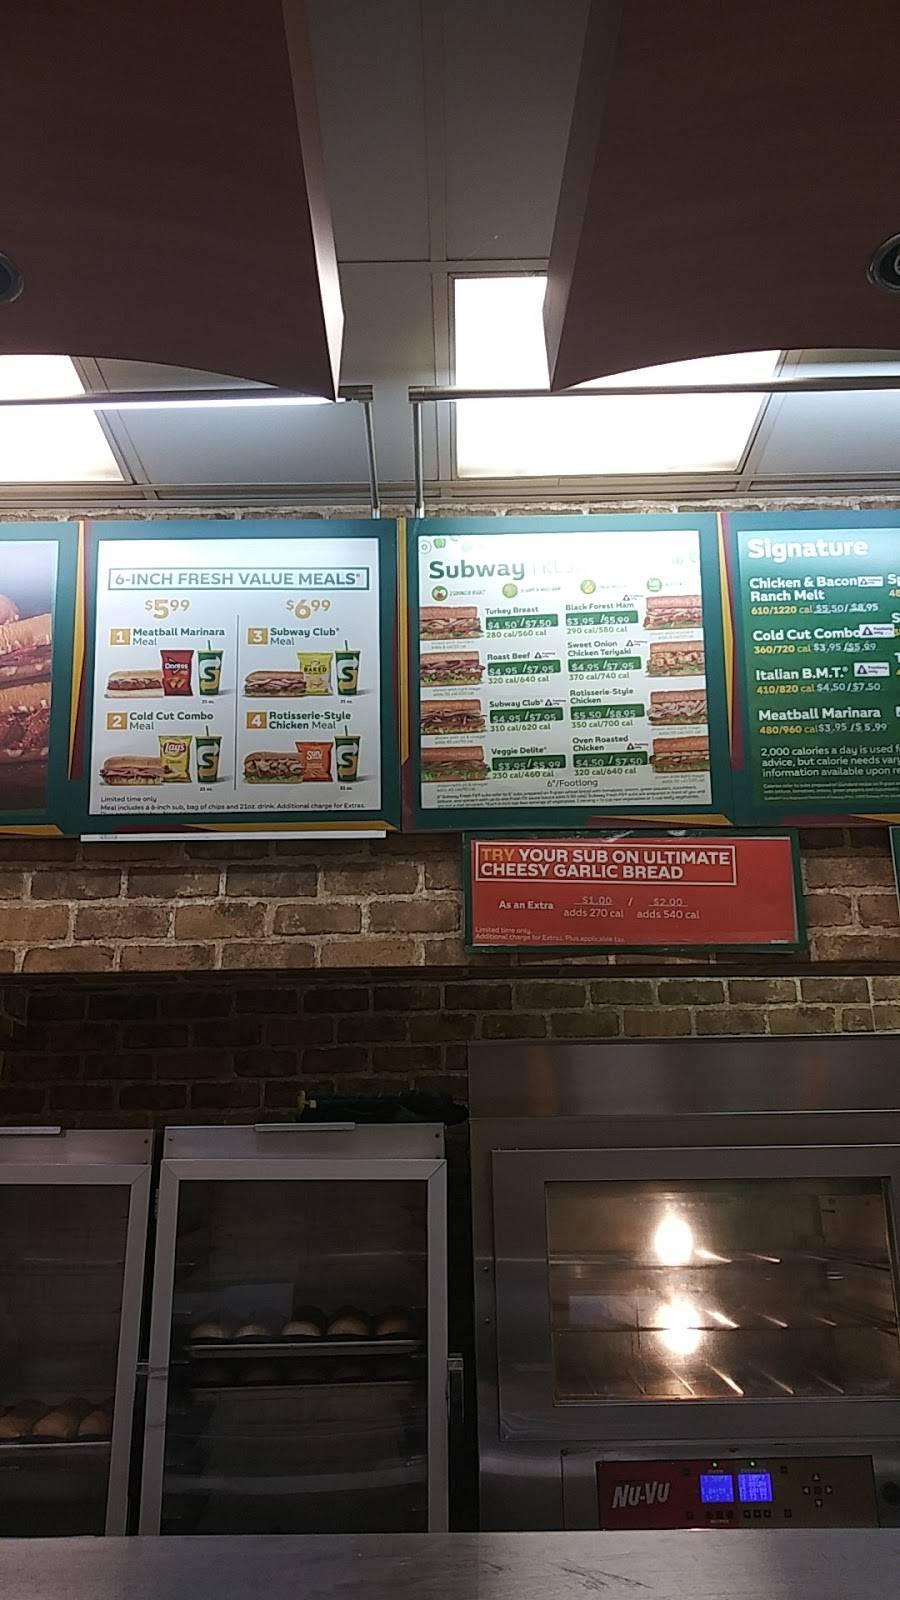 Subway Restaurants   restaurant   118-18 Liberty Ave, South Richmond Hill, NY 11419, USA   7183231858 OR +1 718-323-1858